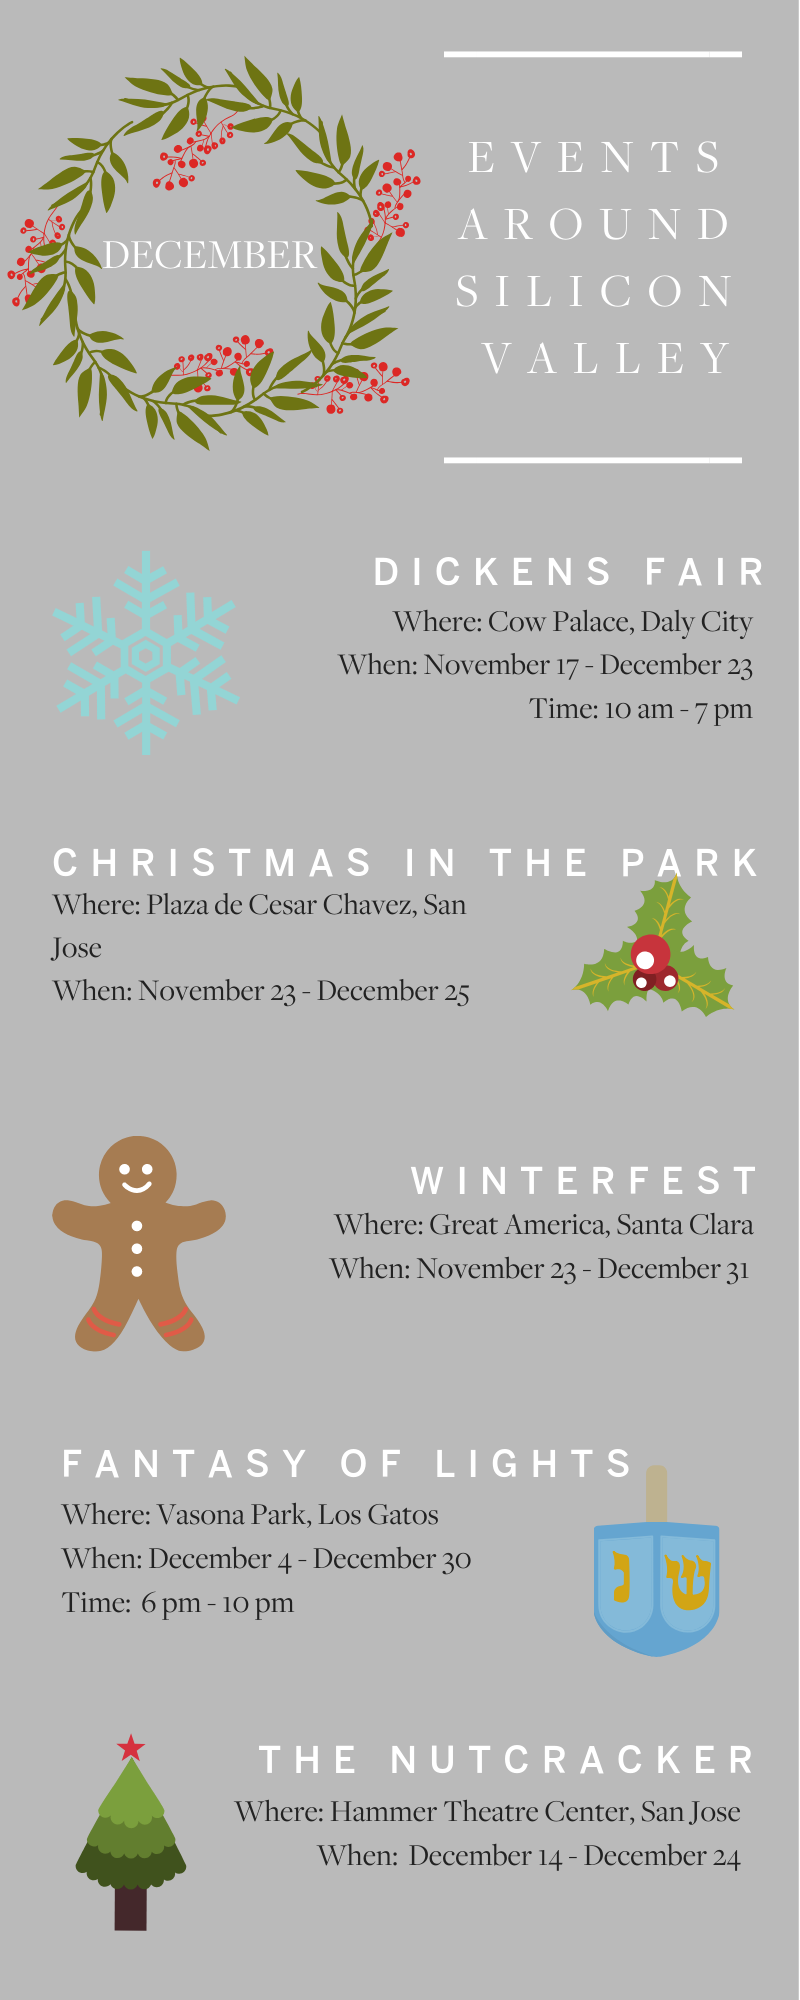 Copy of November Events.png